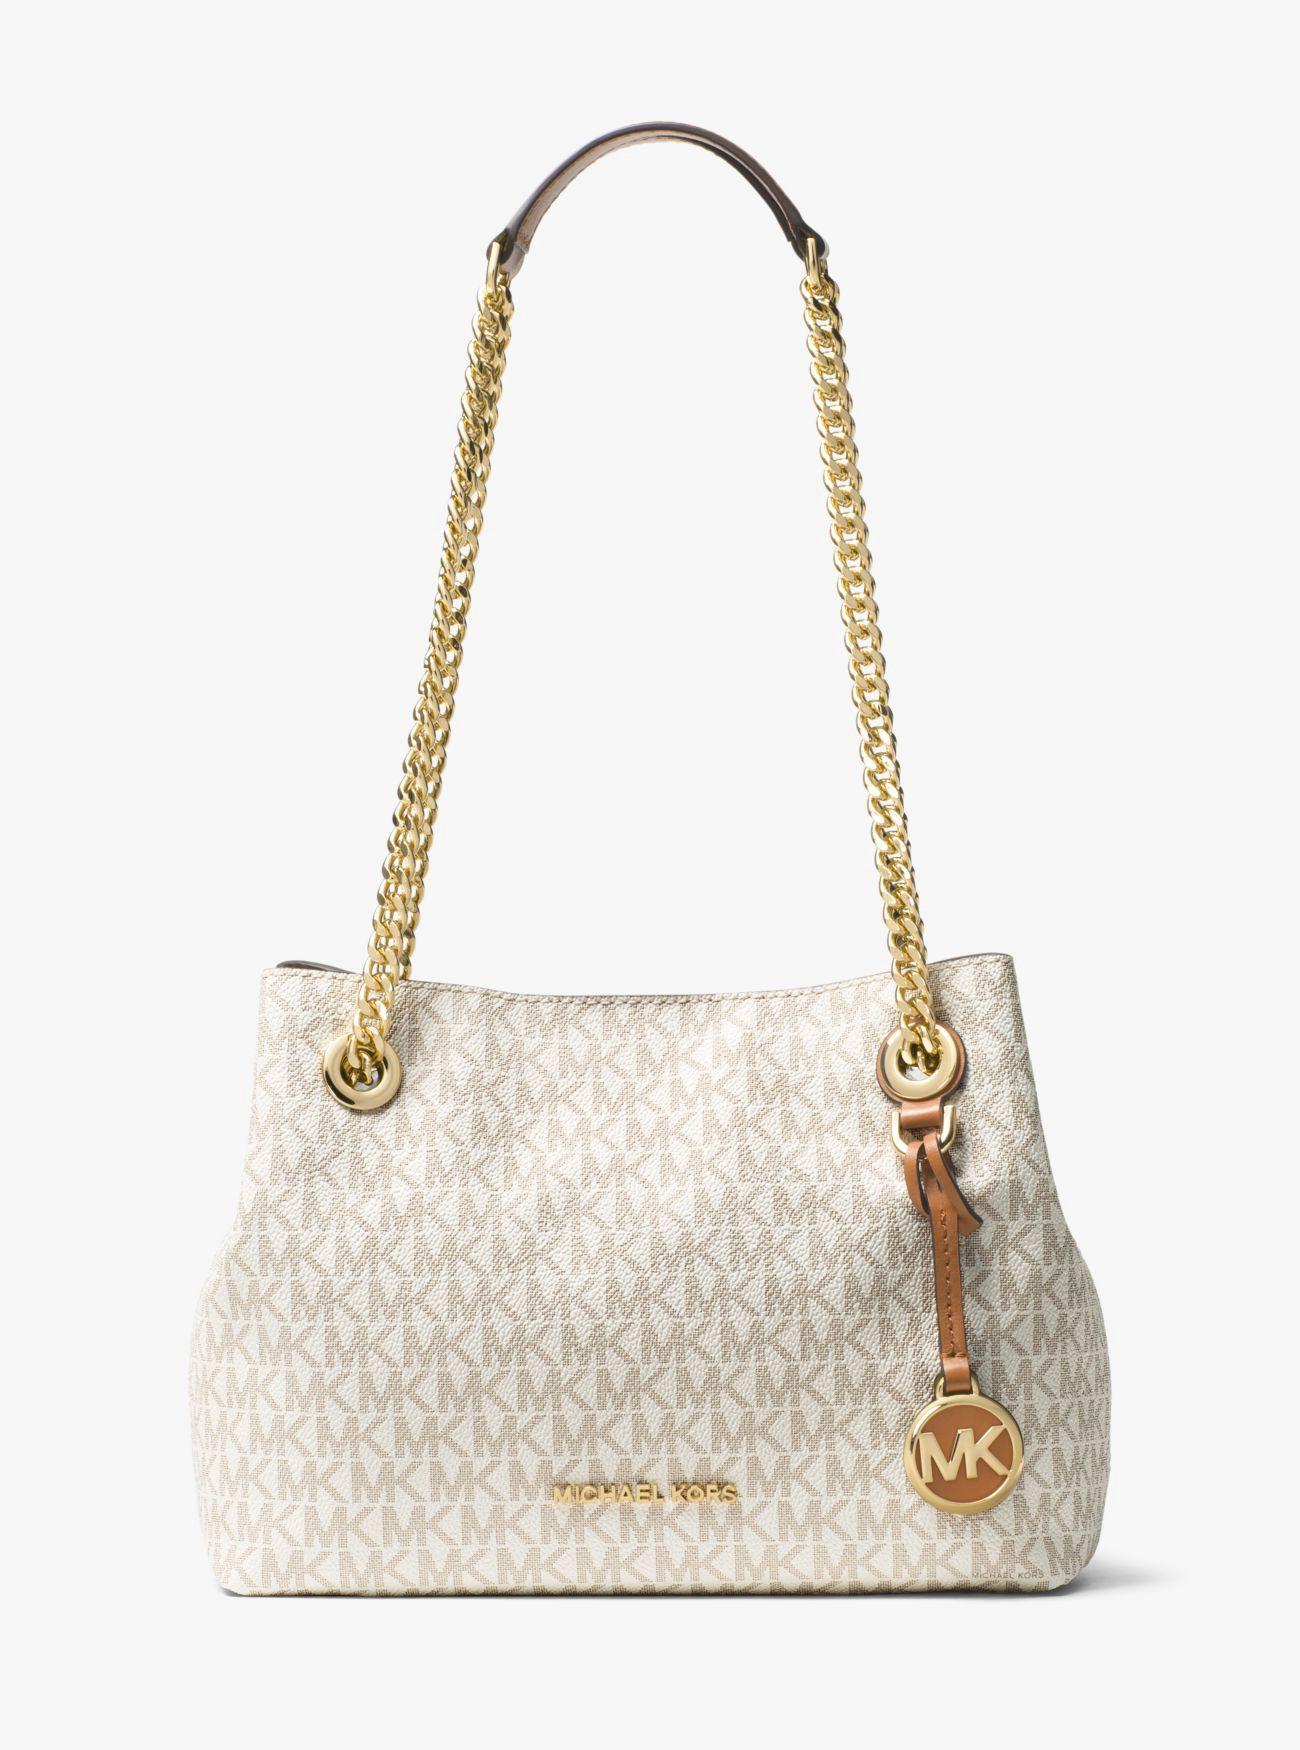 4d4388c5f14b3e Michael Kors Jet Set Logo Shoulder Bag In Vanilla | ModeSens